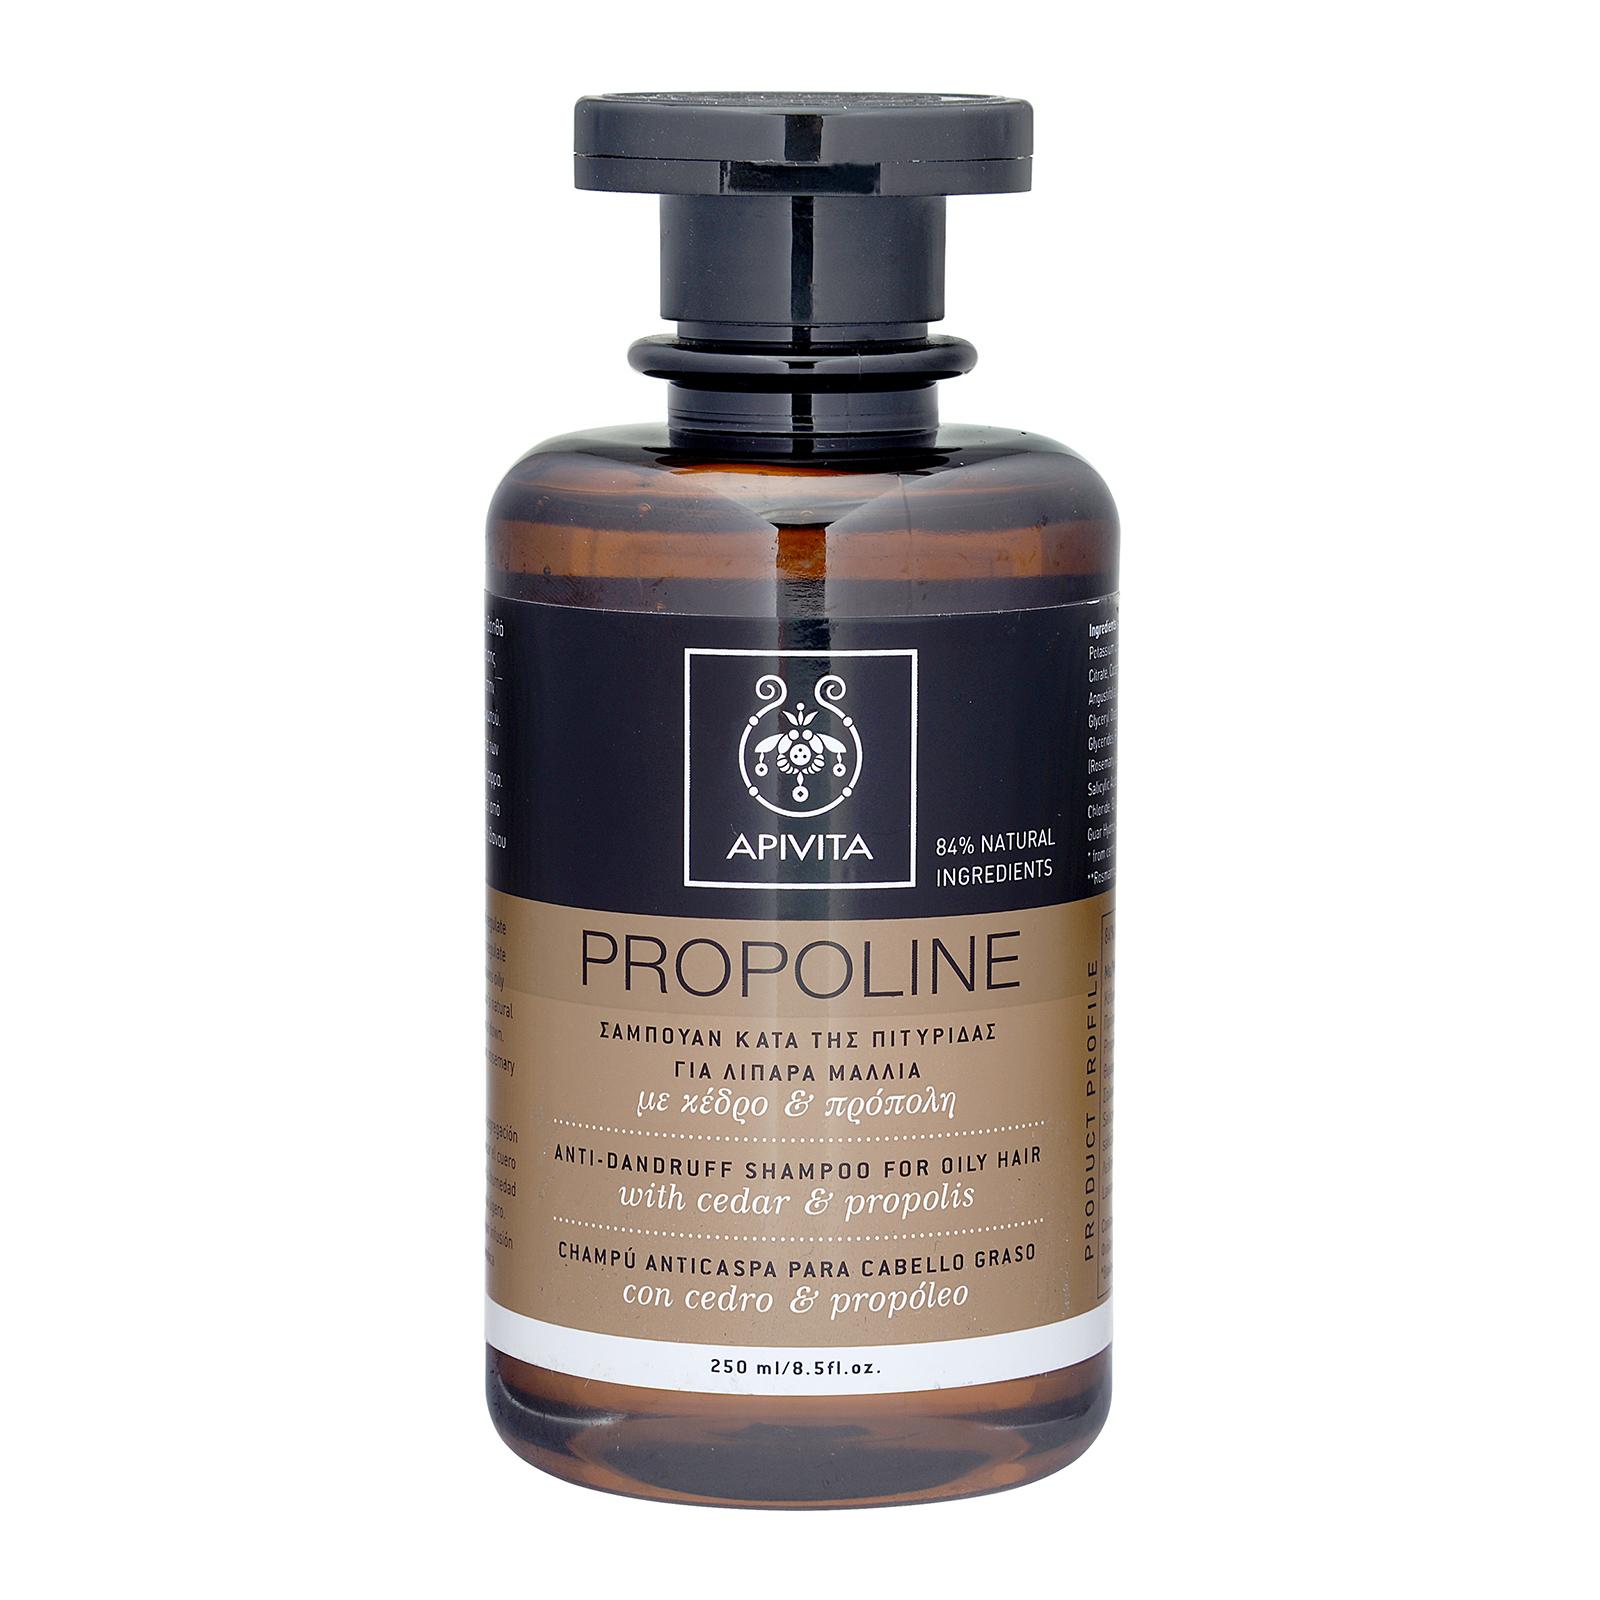 APIVITA Propoline Anti-Dandruff Shampoo For Oily Hair with Cedar & Propolis 8.5oz, 250ml from Cosme-De.com